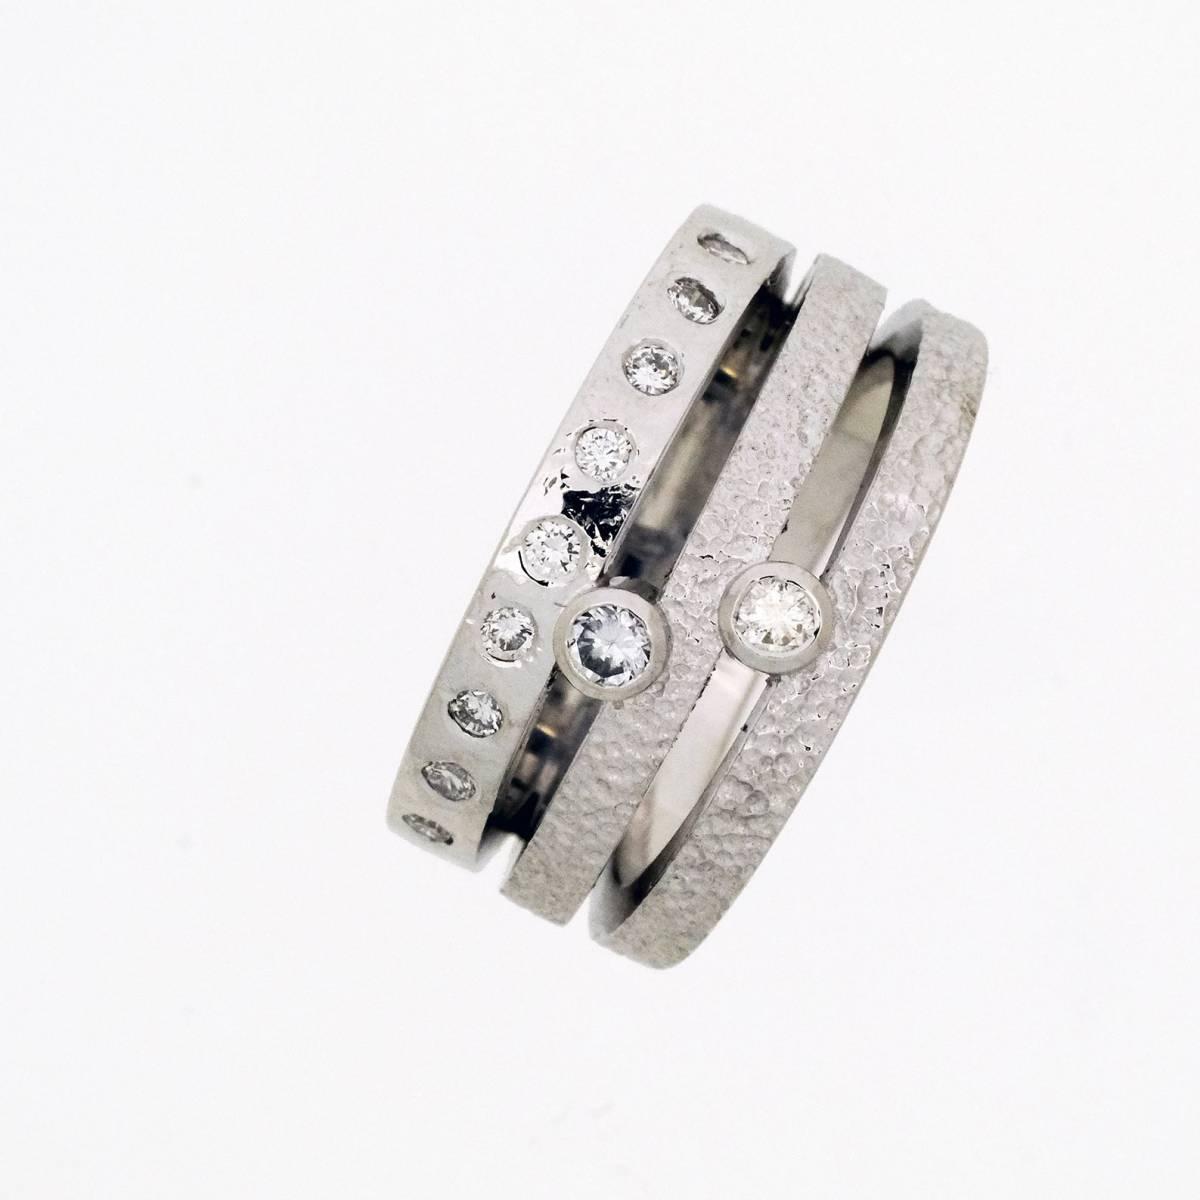 Jonas Maes Jewels - Juwelen - Bruidsjuwelen - Verlovingsring - Trouwring - House of Weddings - 18